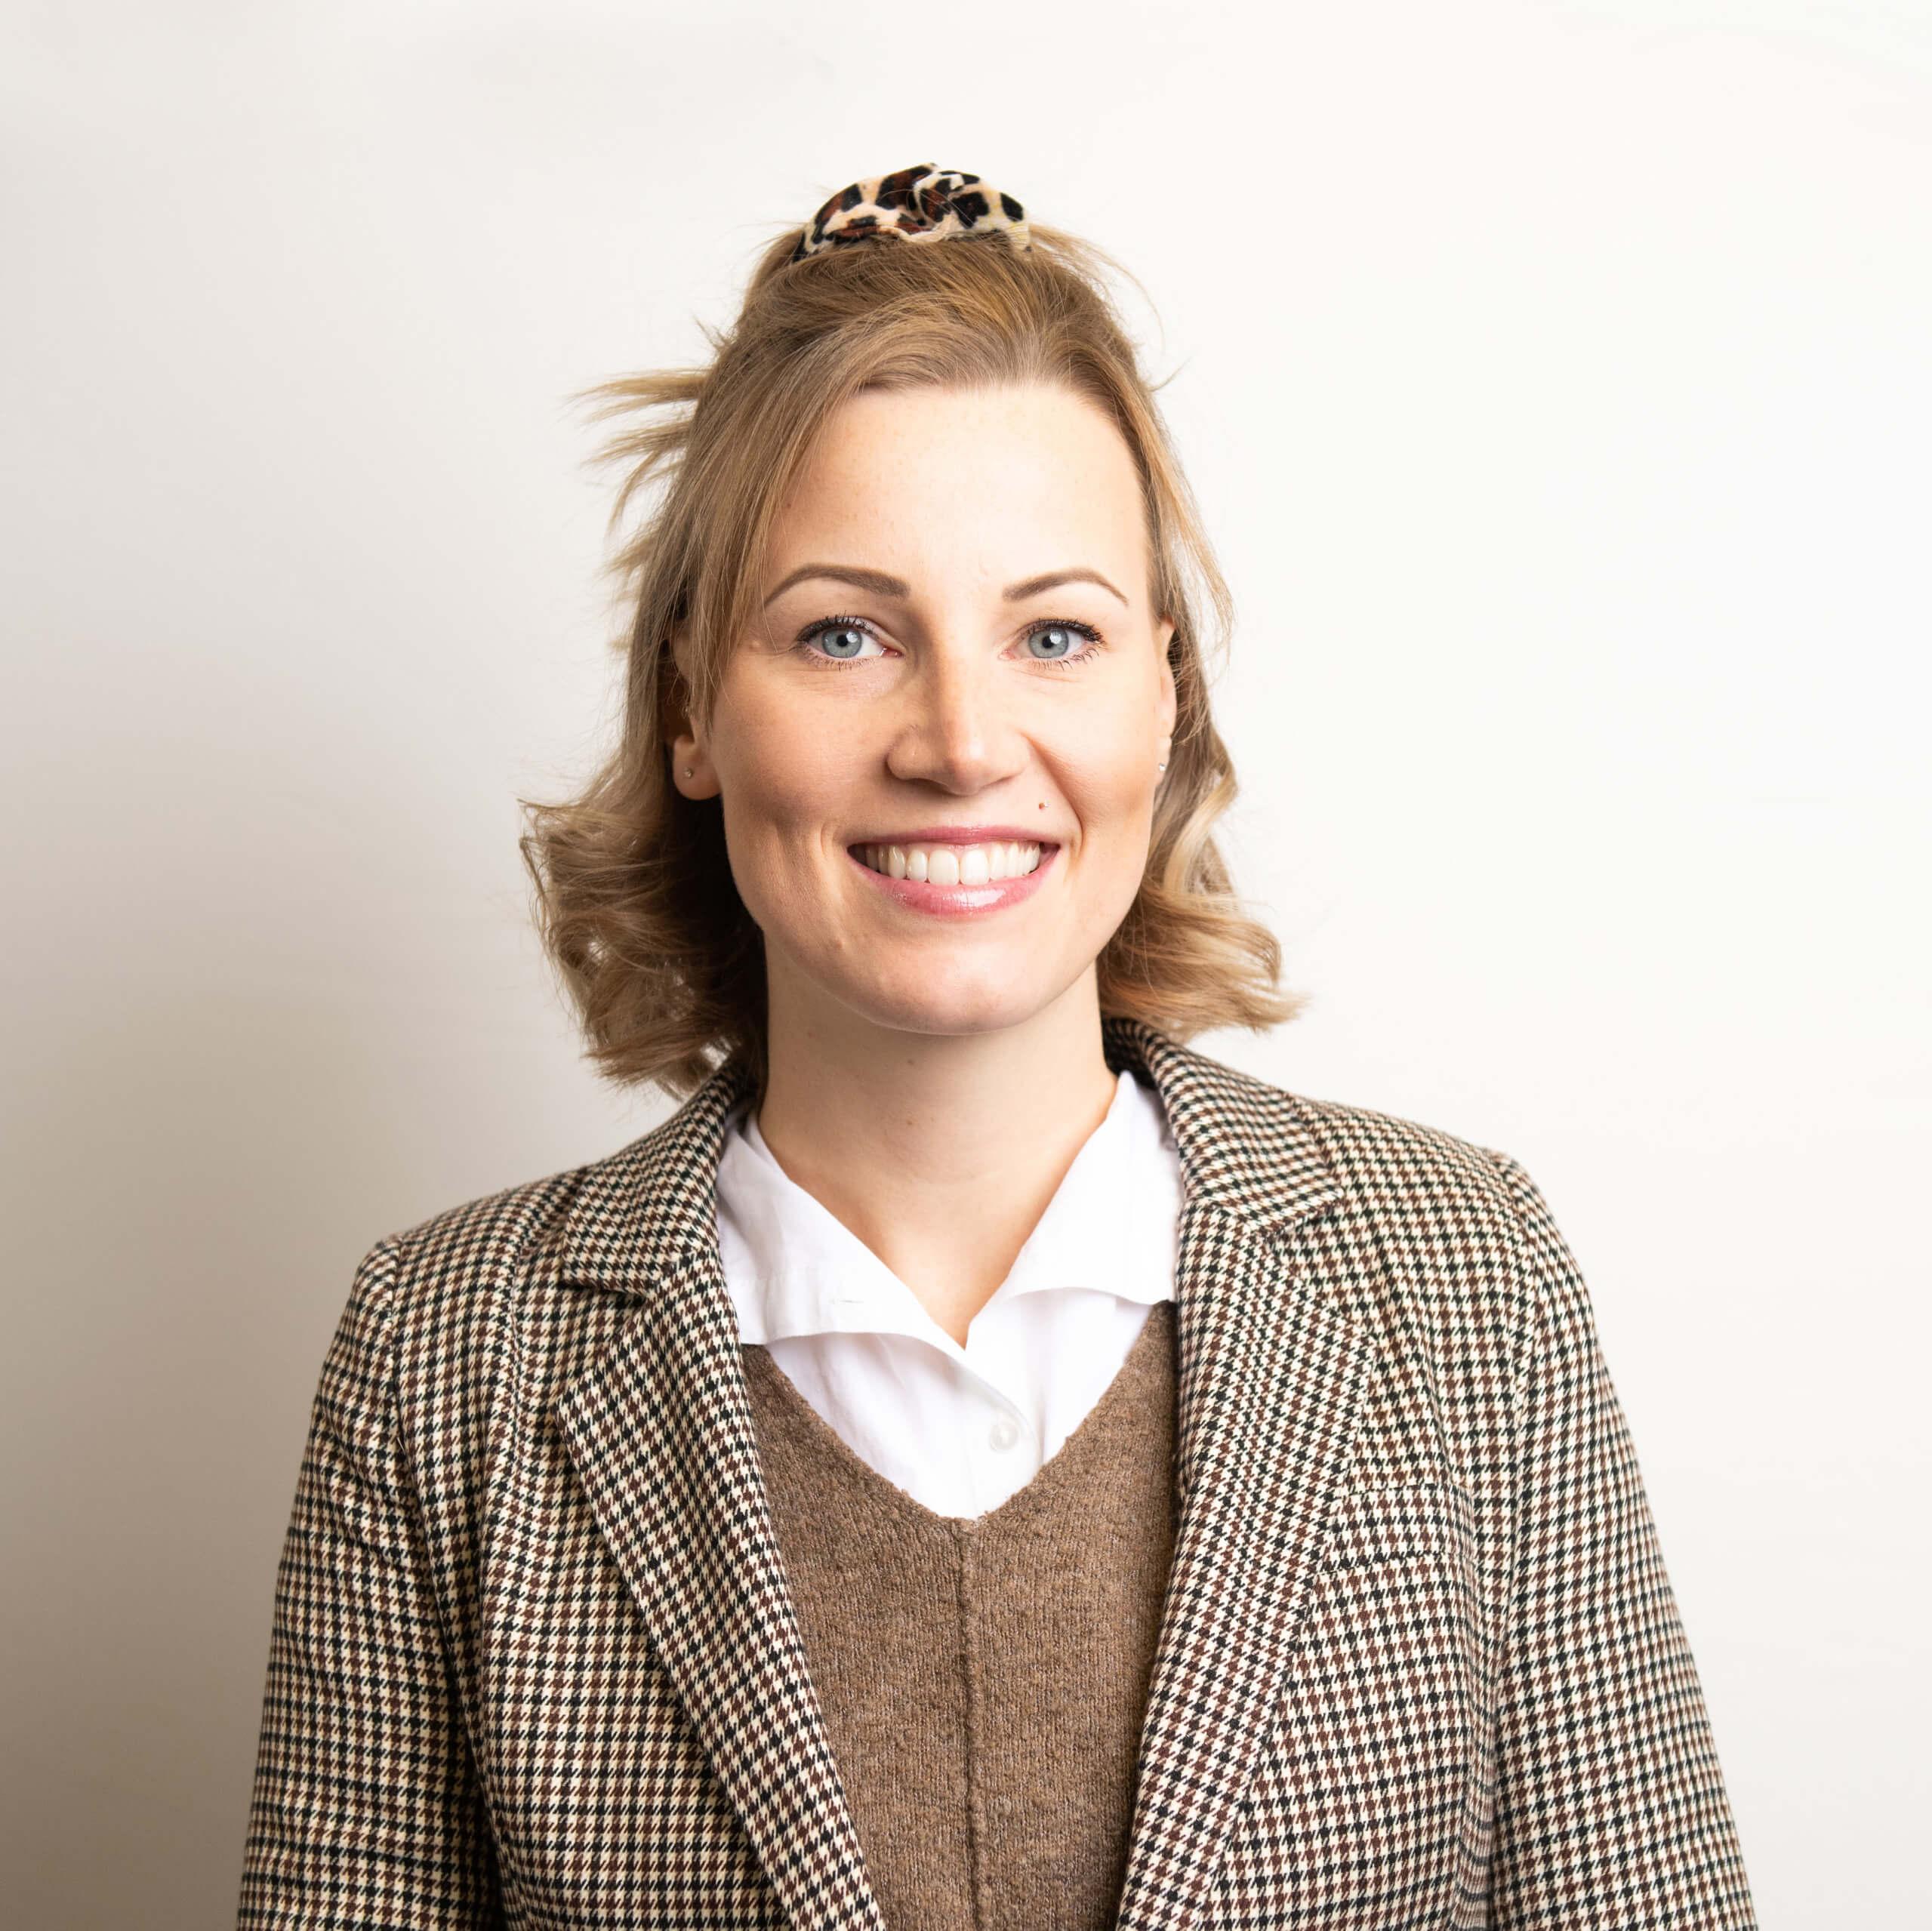 https://www.haar-werk.ch/wp-content/uploads/2020/12/Daniela-Hofer.jpg